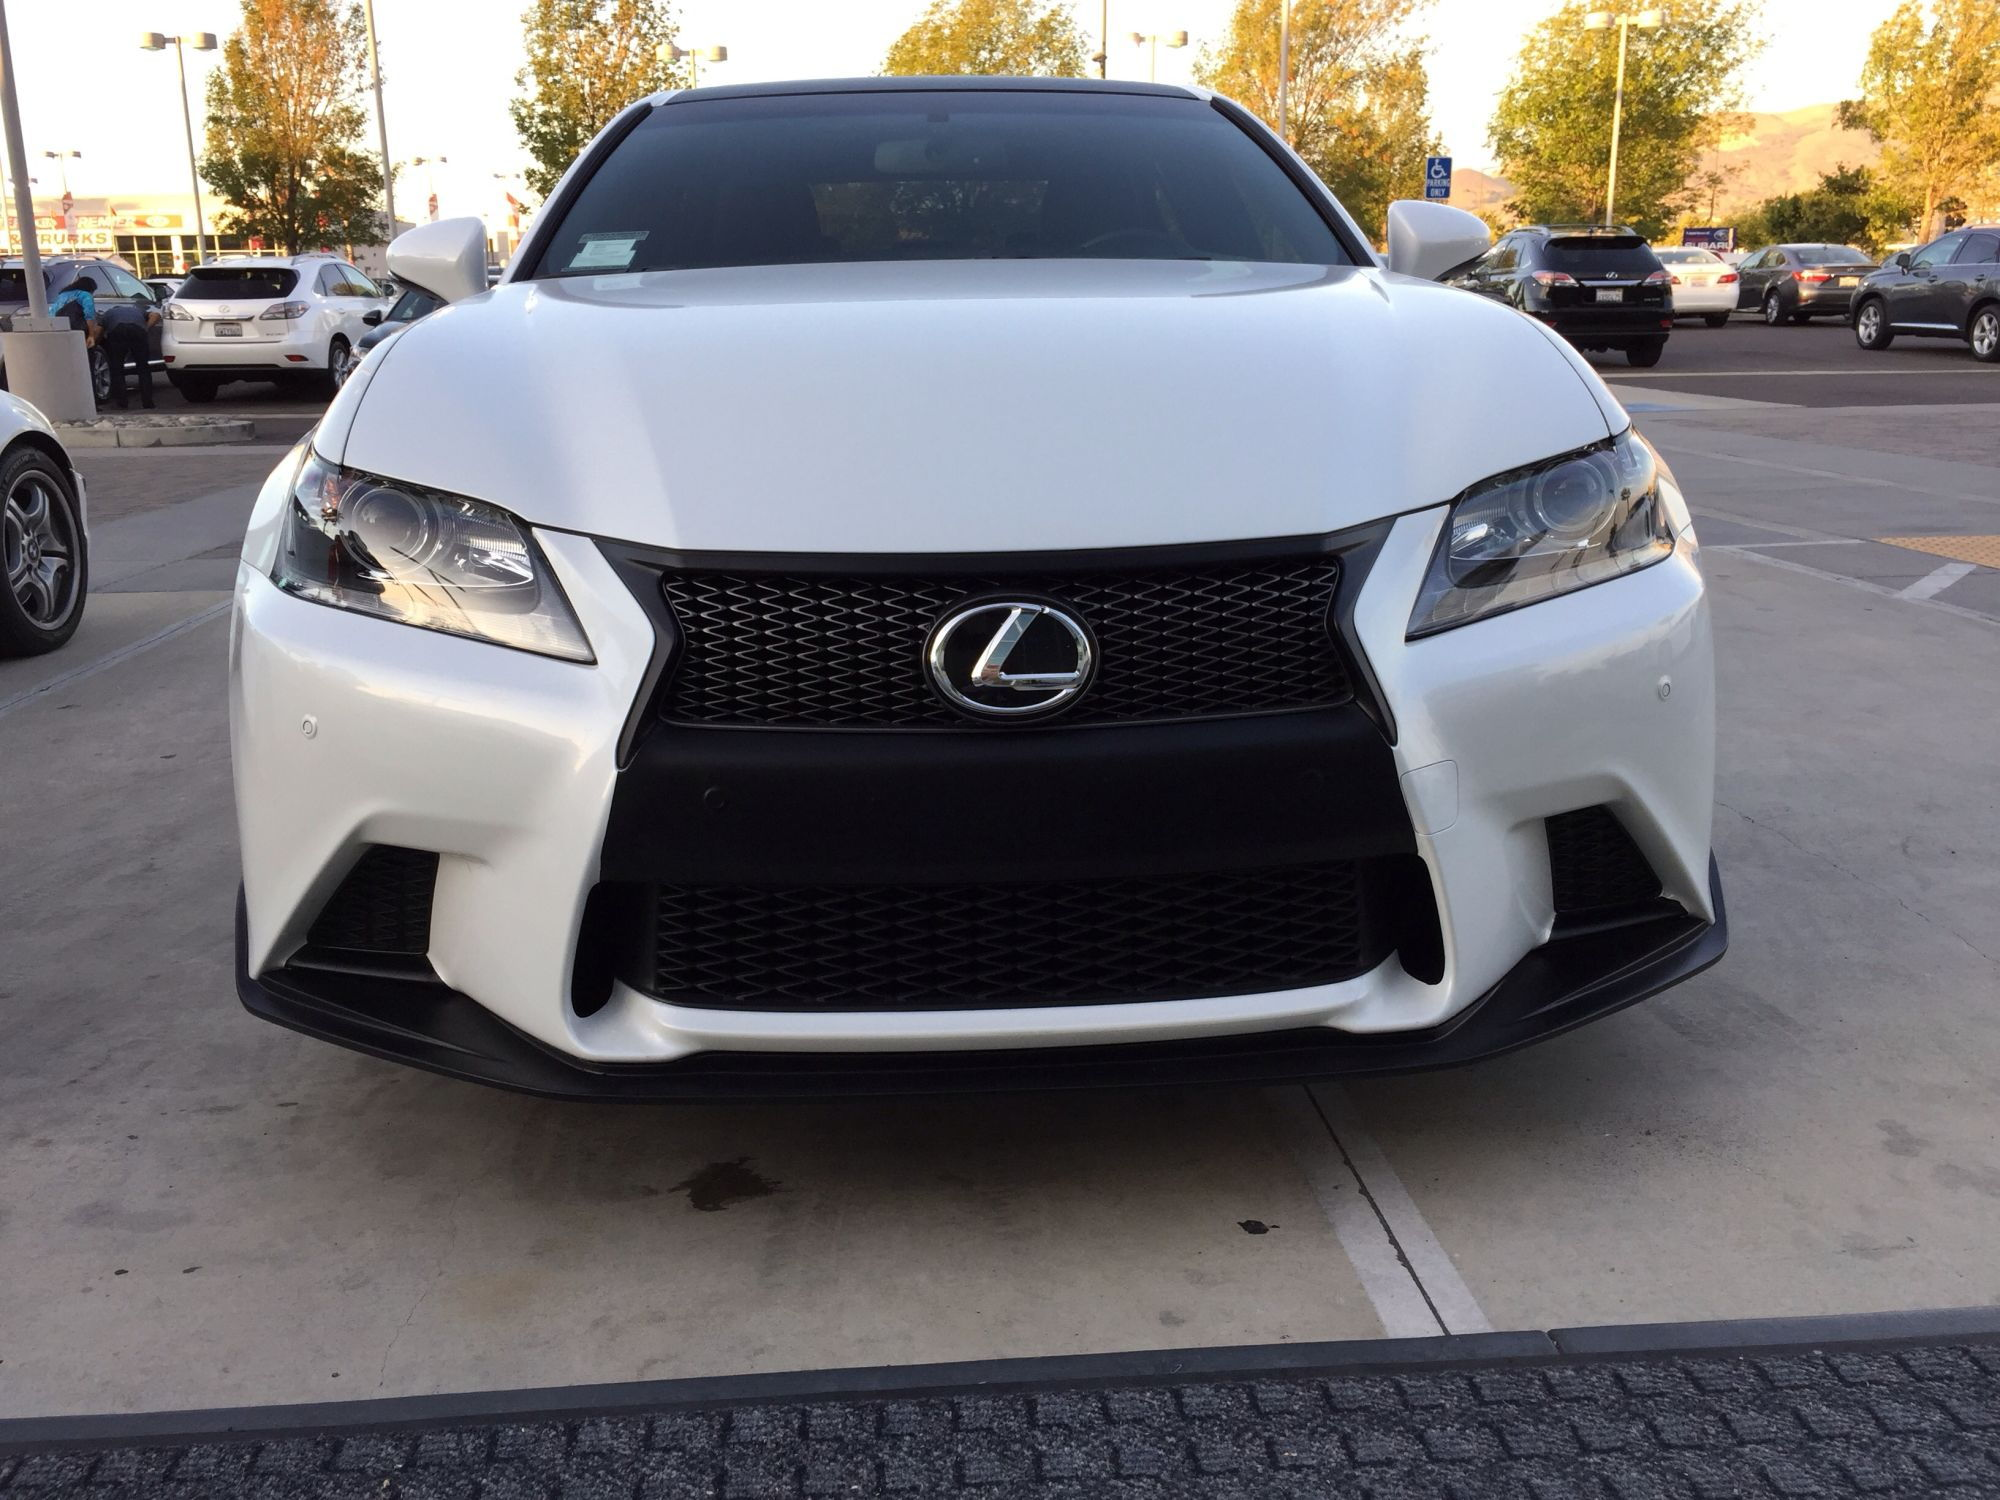 How To Unlock Steering Wheel >> LA **2015 GS350 F-Sport Lease Transfer** - ClubLexus - Lexus Forum Discussion